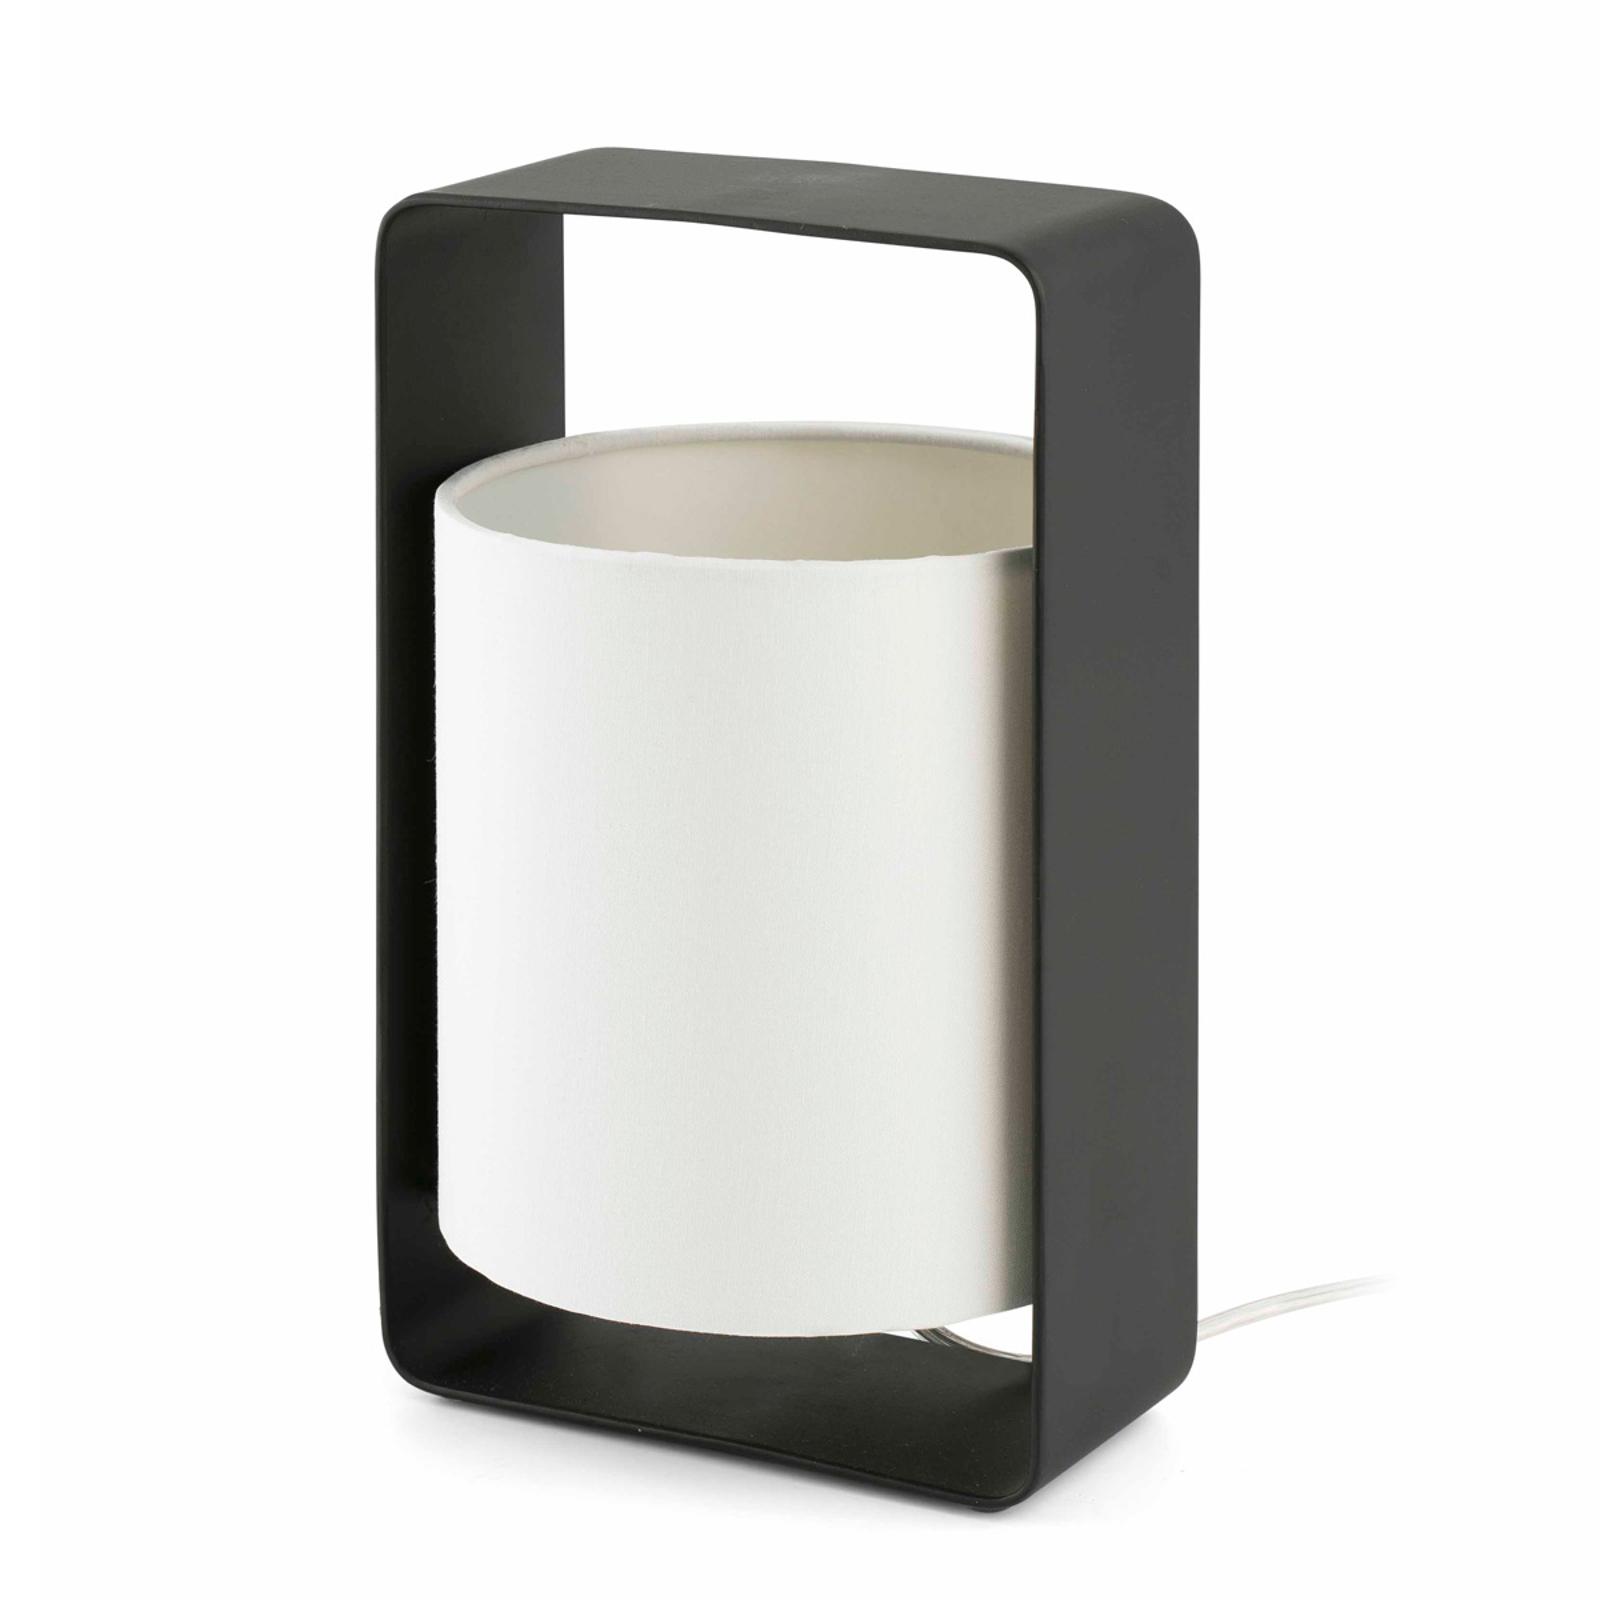 Lula table lamp in white, 27 cm_3507168_1